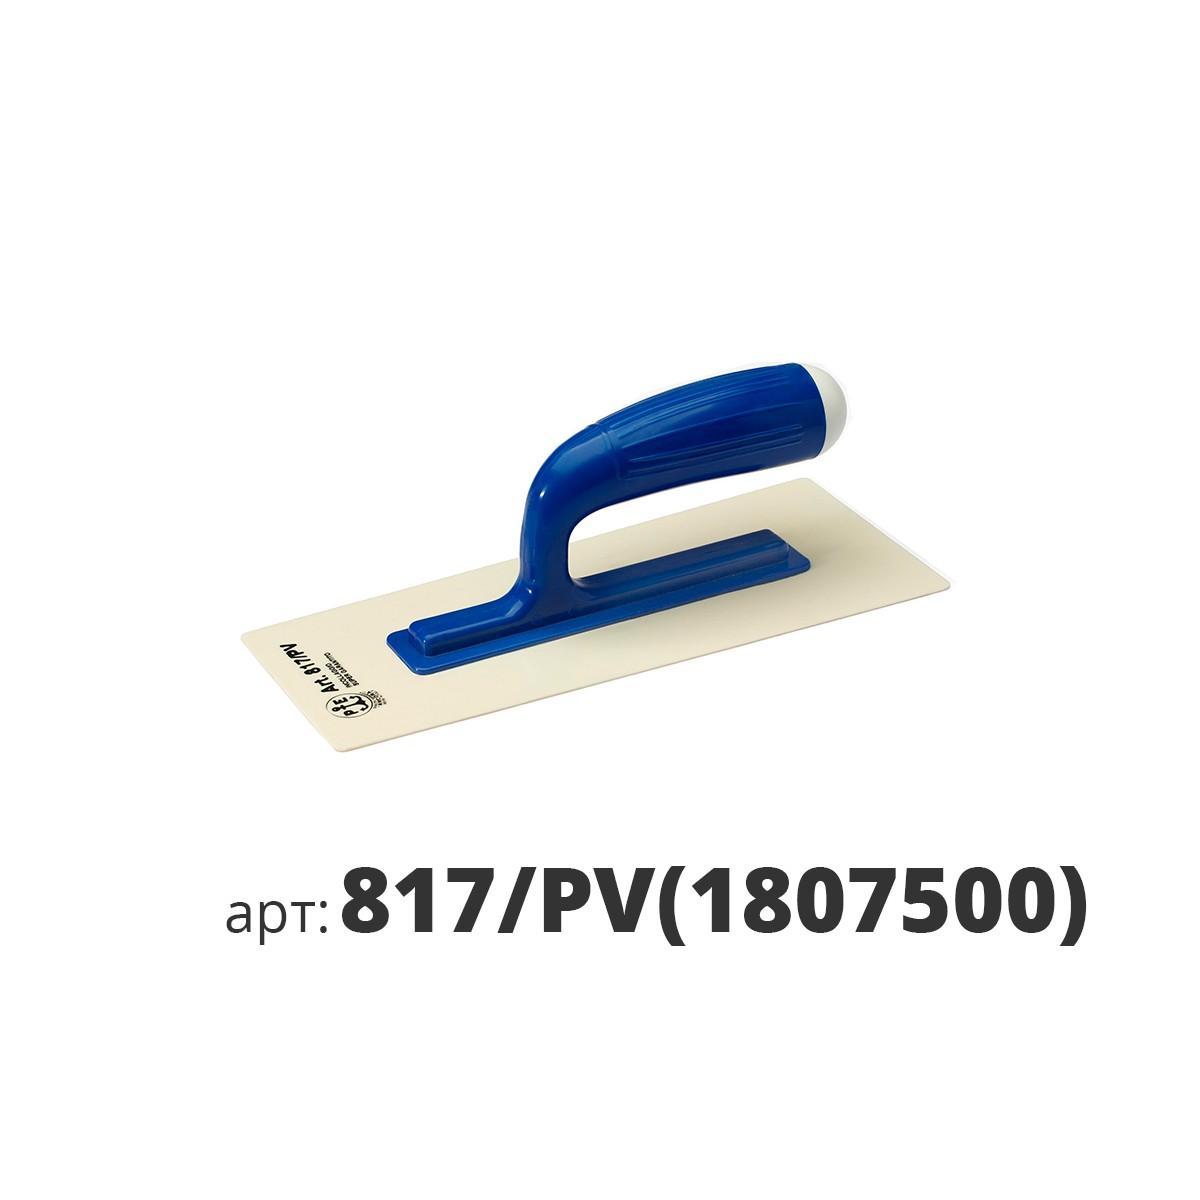 PAVAN кельма пластиковая прямоугольная белая 817/PV(1807500)